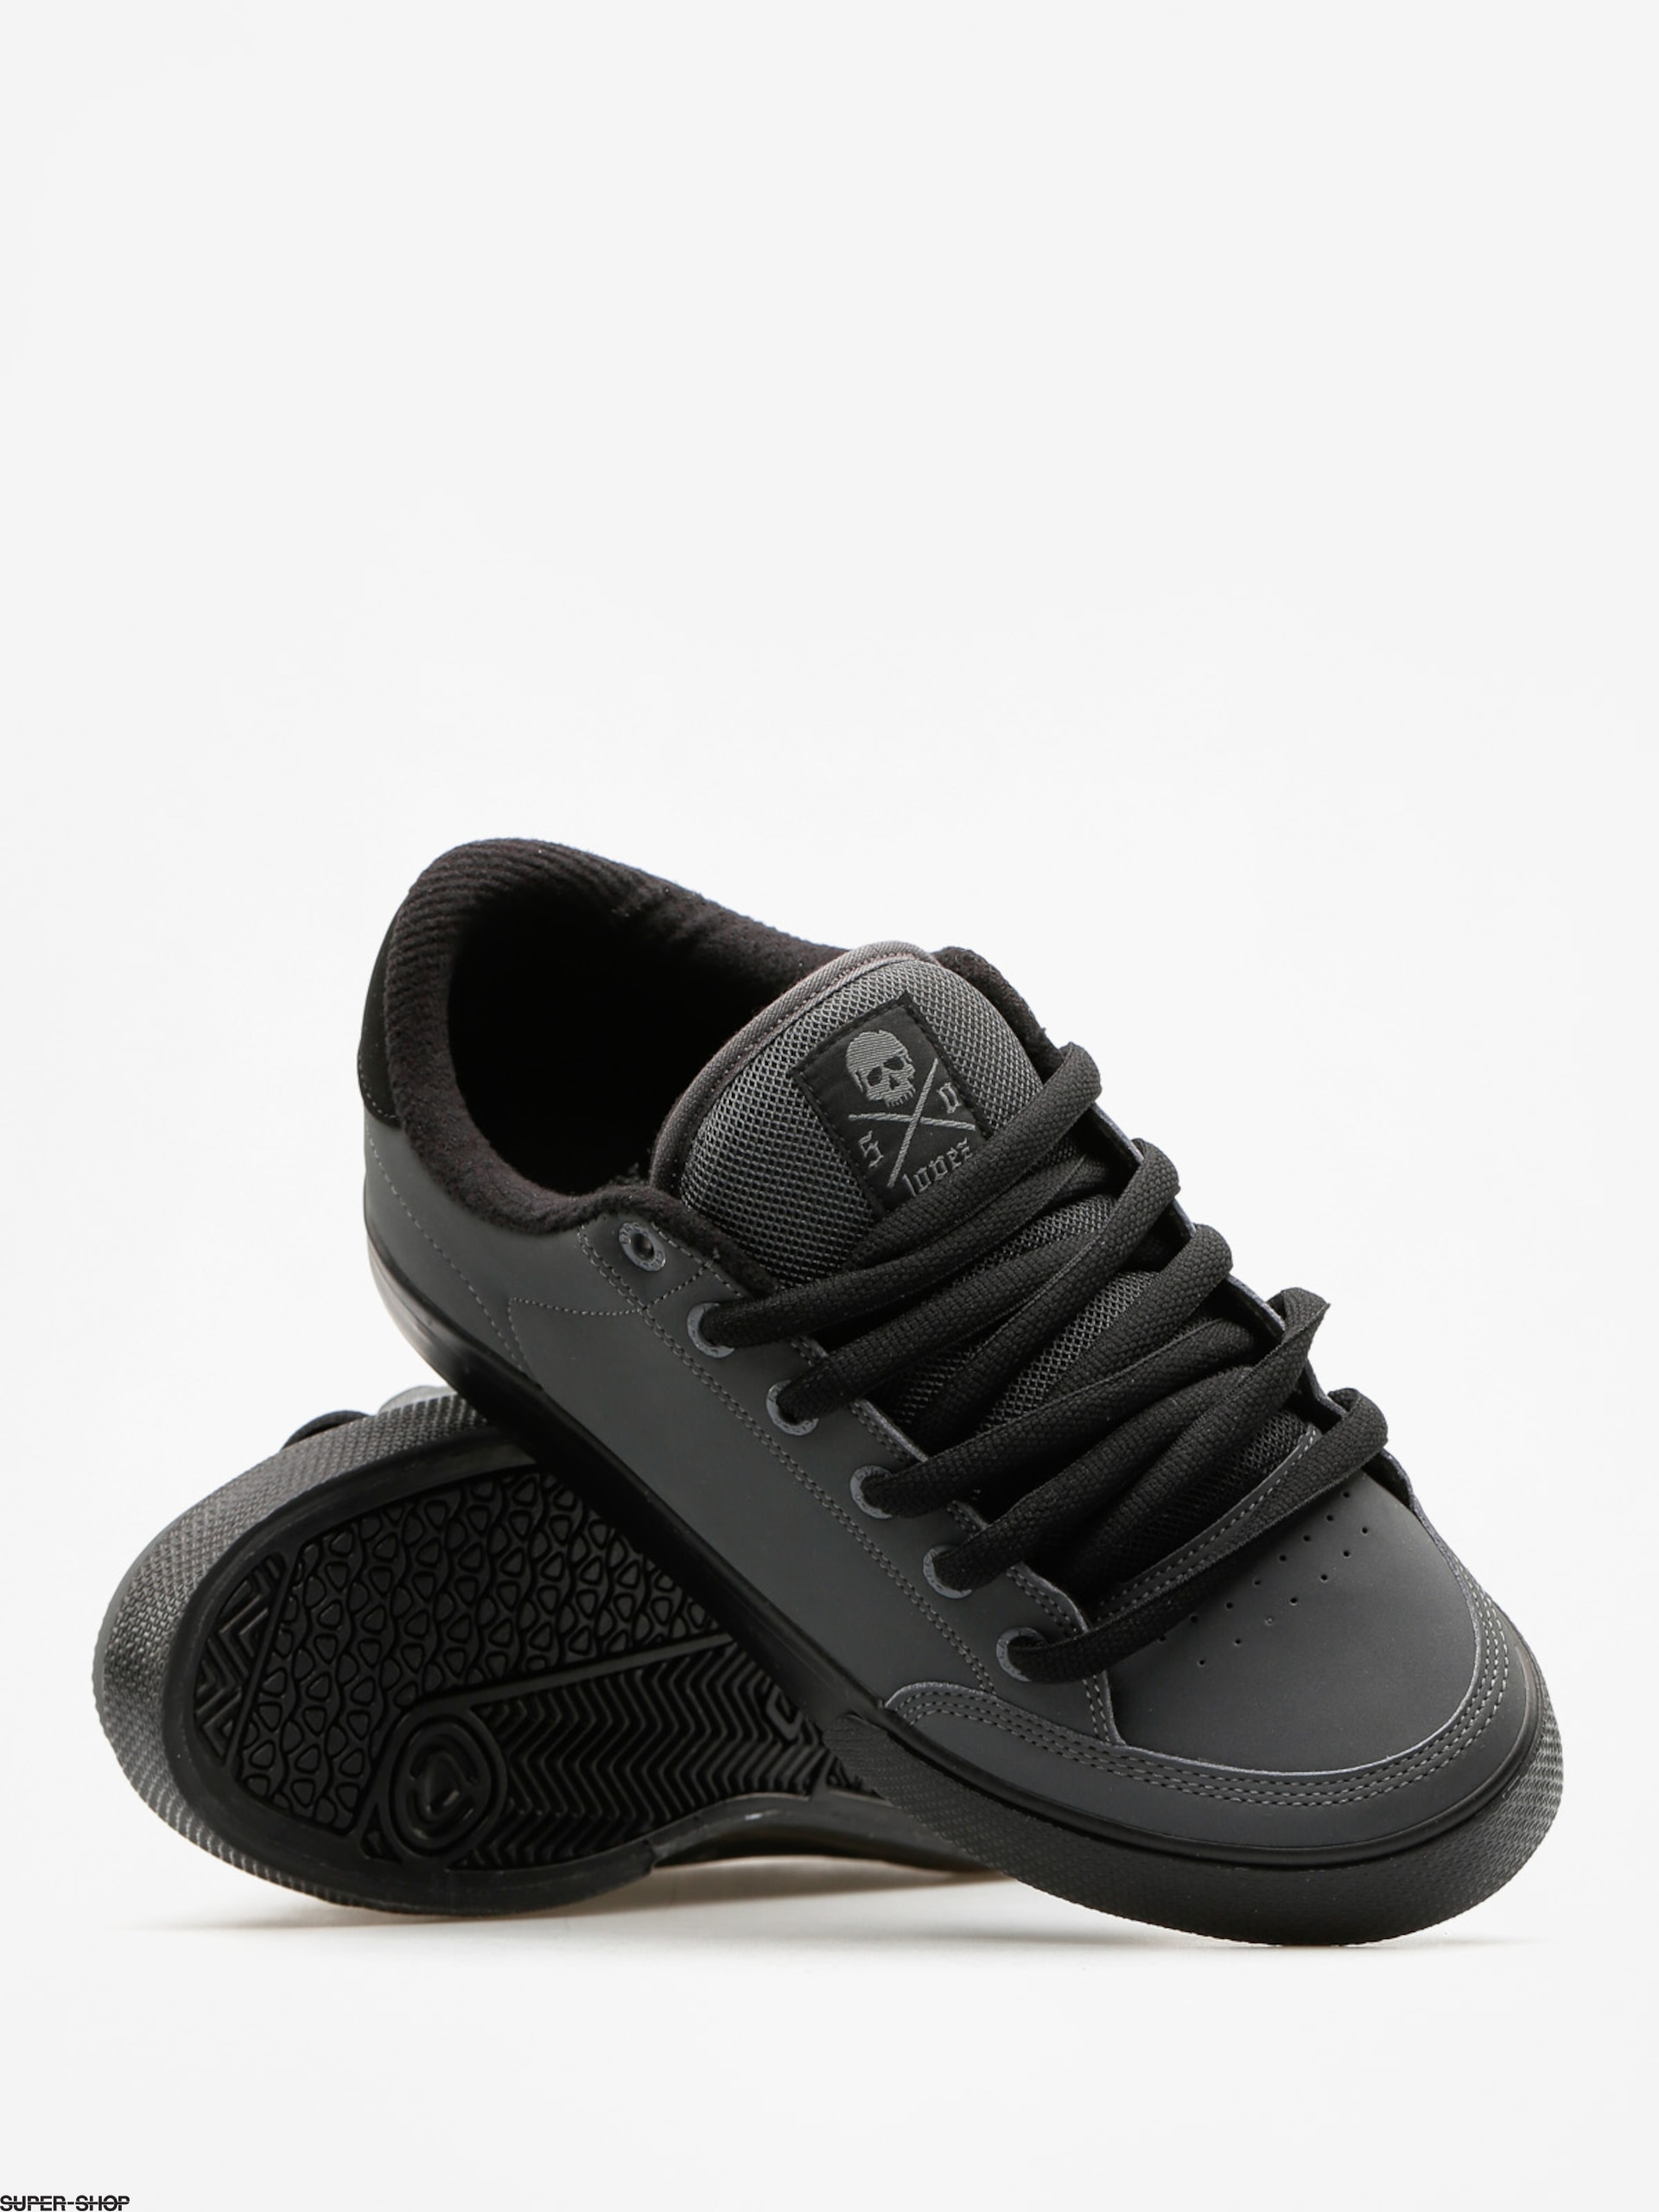 c9d1a57aeb Circa Shoes Lopez 50 (shadow black)